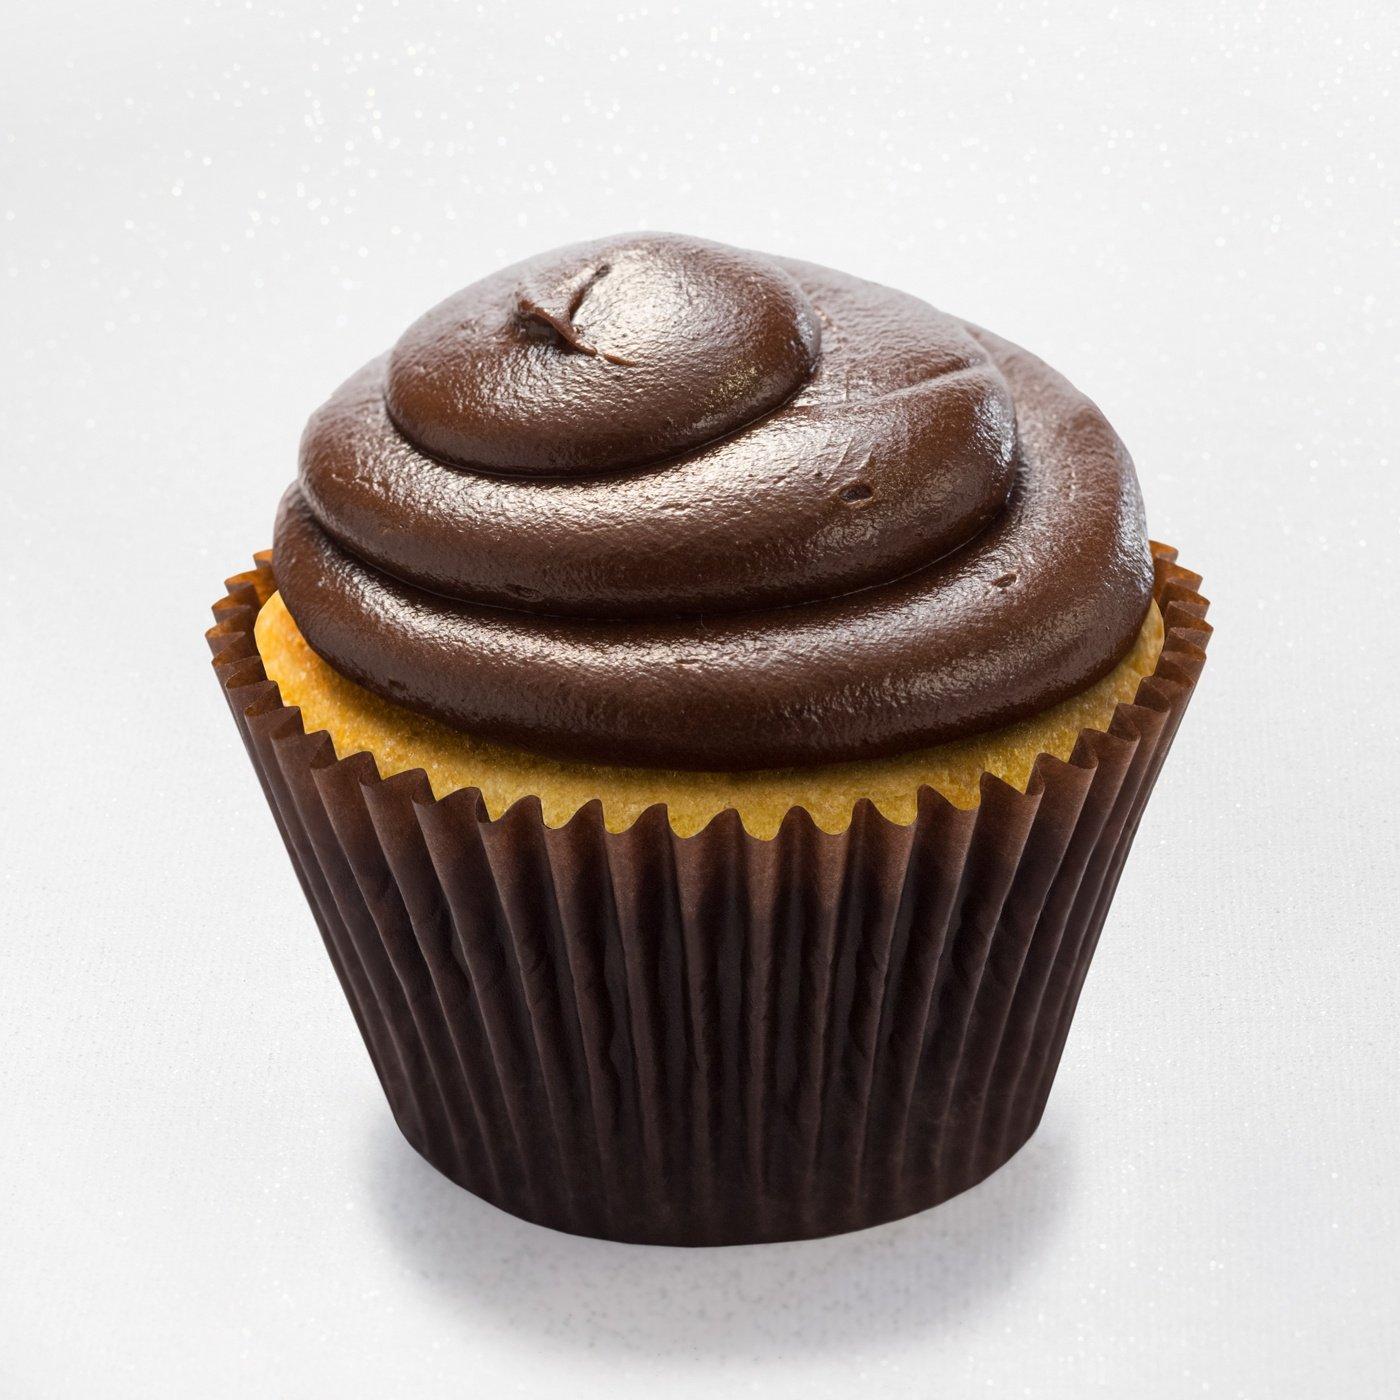 Vanilla cupcake with chocolate fudge